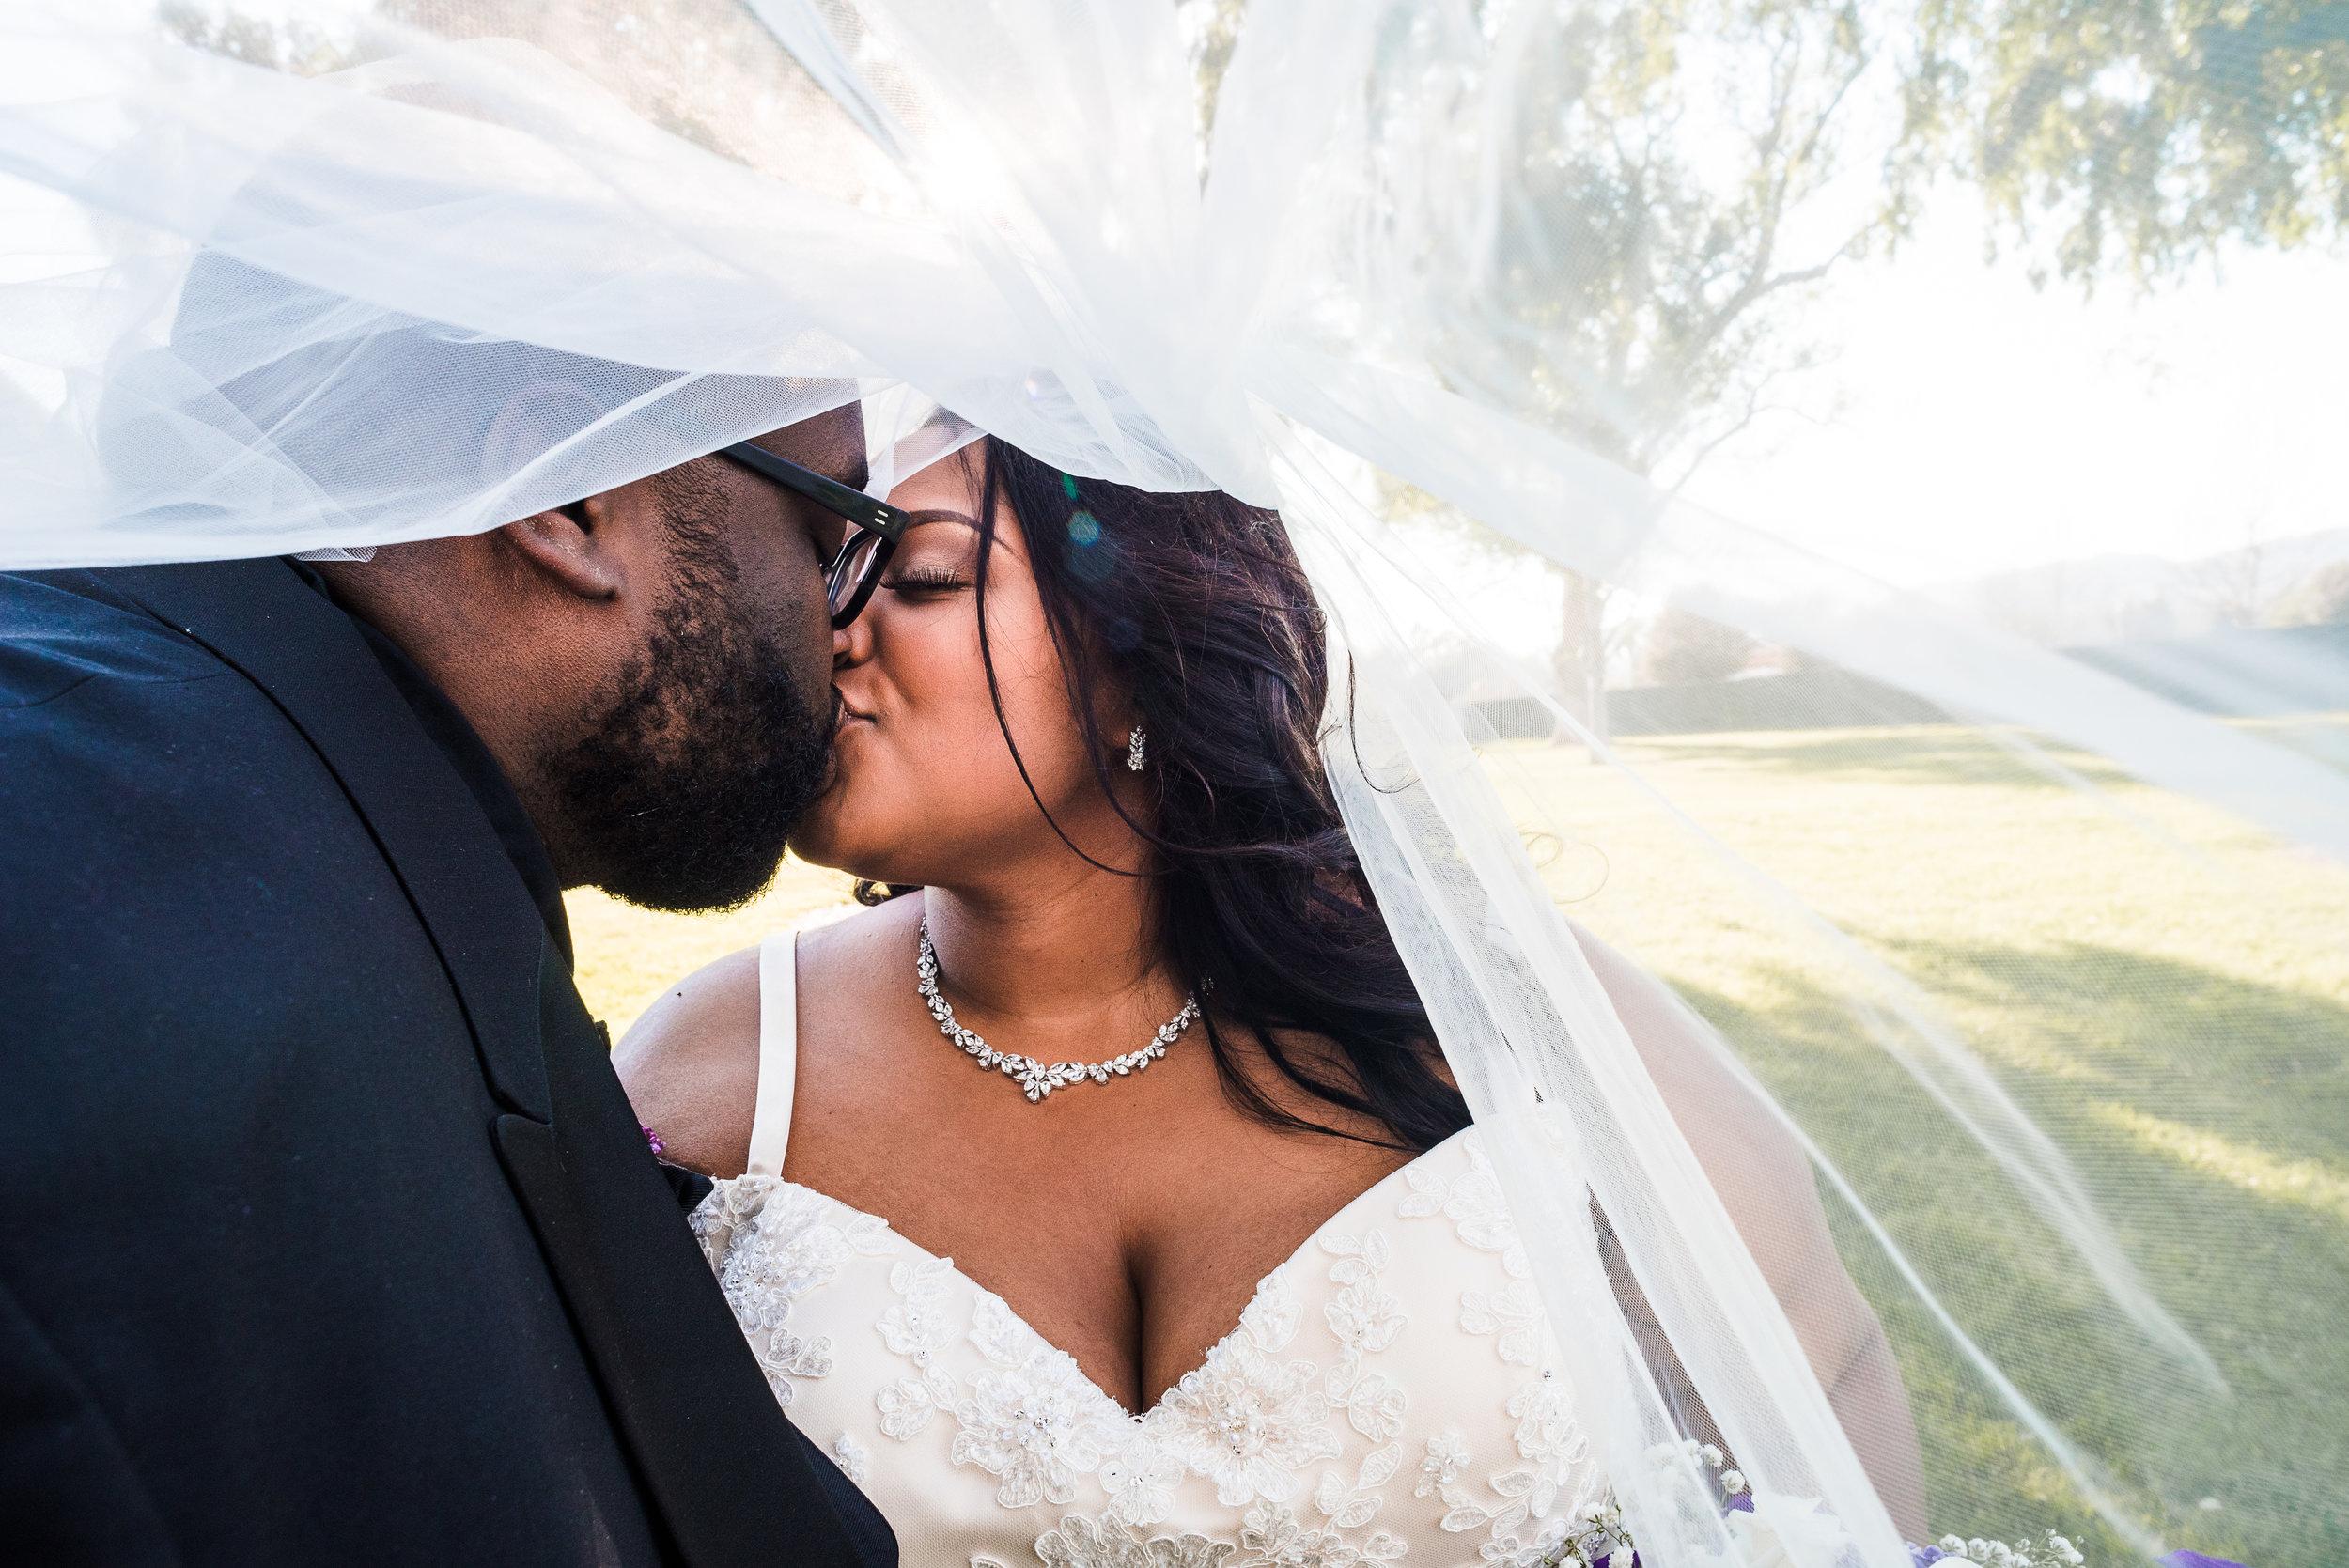 st-louis-wedding-photographer-moreno-valley-wedding-489.jpg